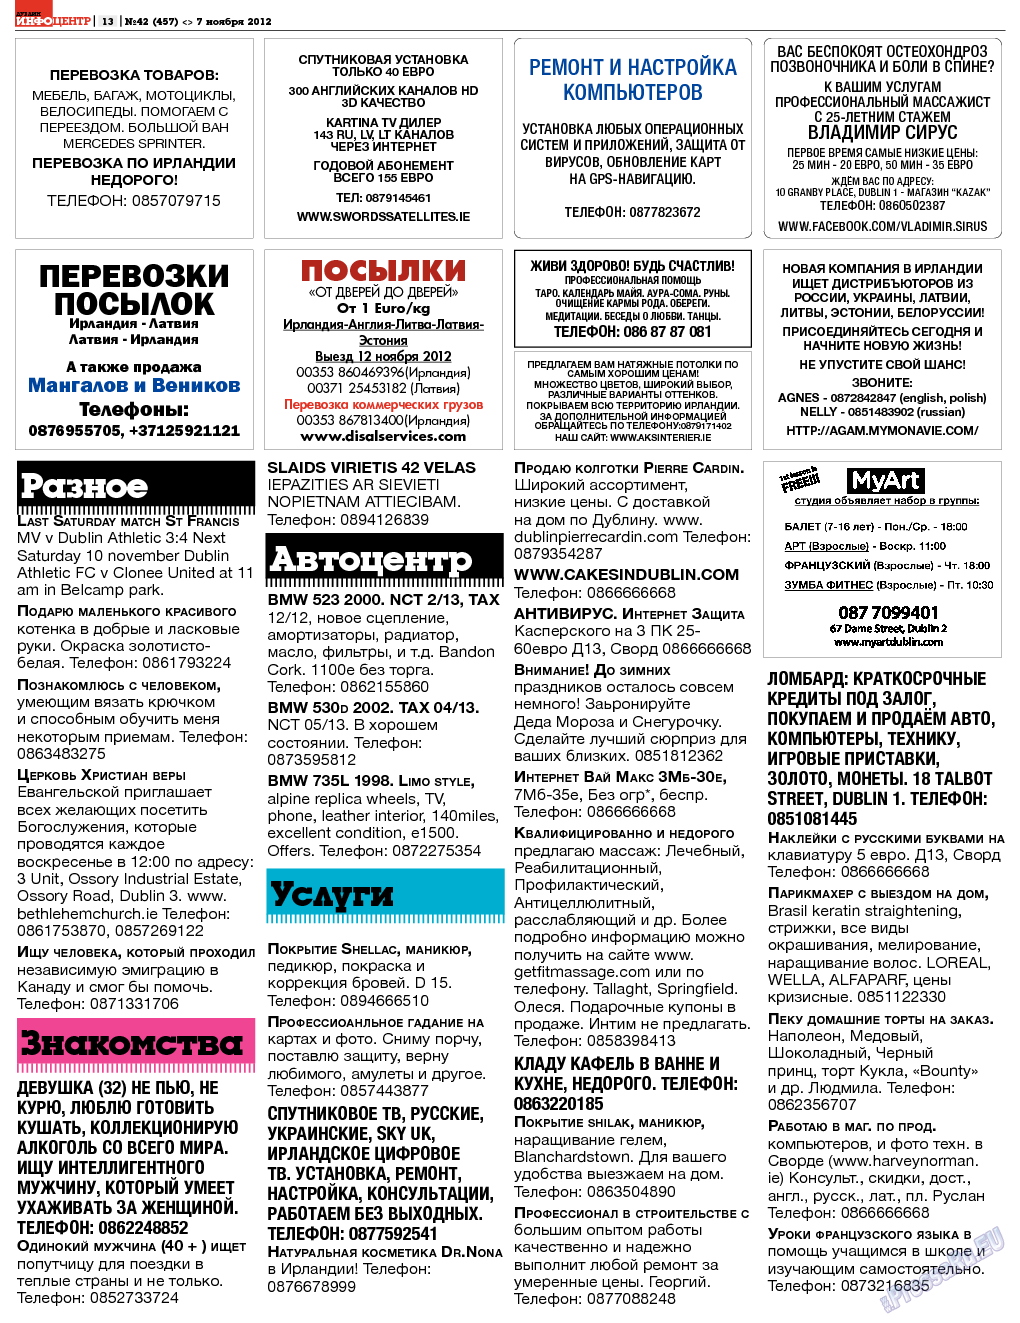 Дублин инфоцентр (газета). 2012 год, номер 42, стр. 13